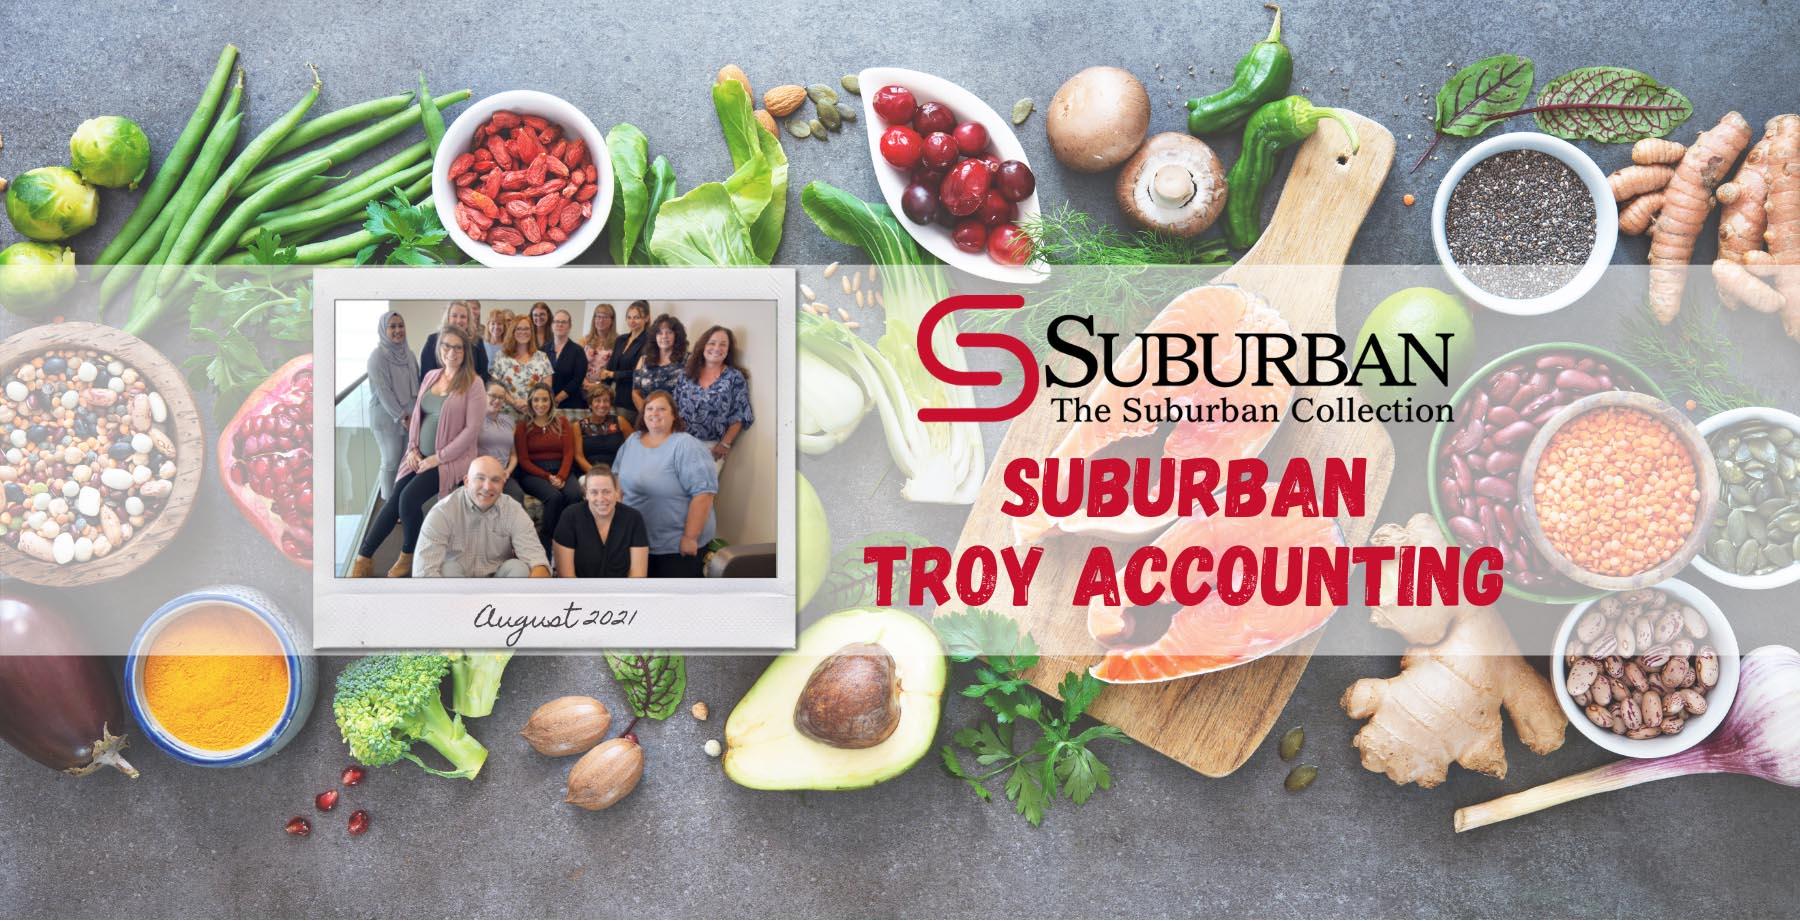 Suburban Troy Accounting